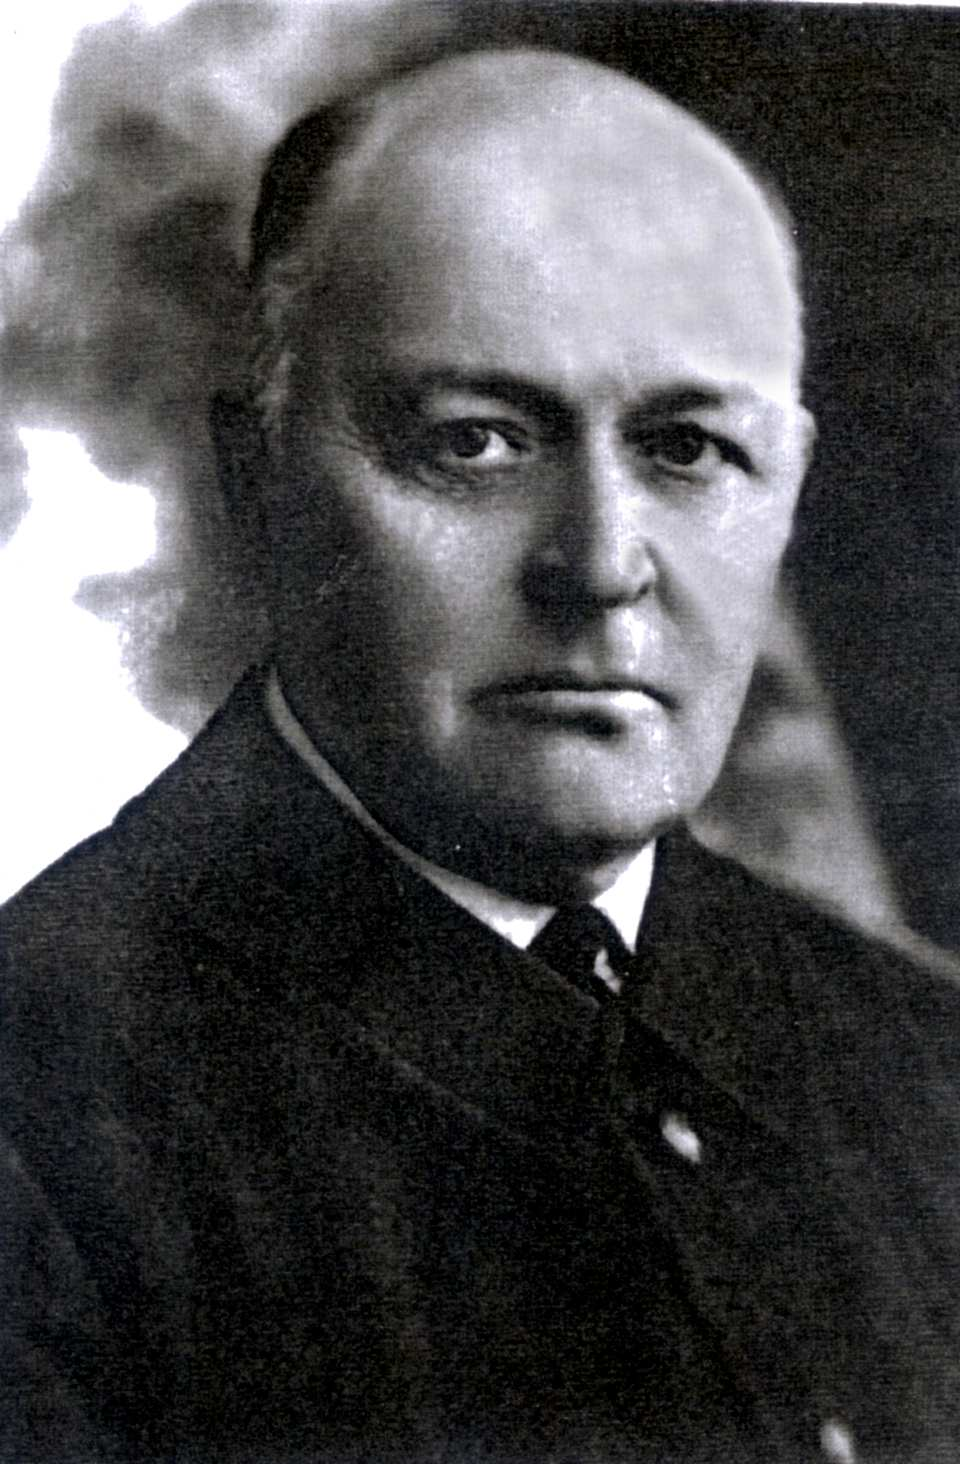 https://upload.wikimedia.org/wikipedia/lt/d/d7/ZubovasVladimir.jpg